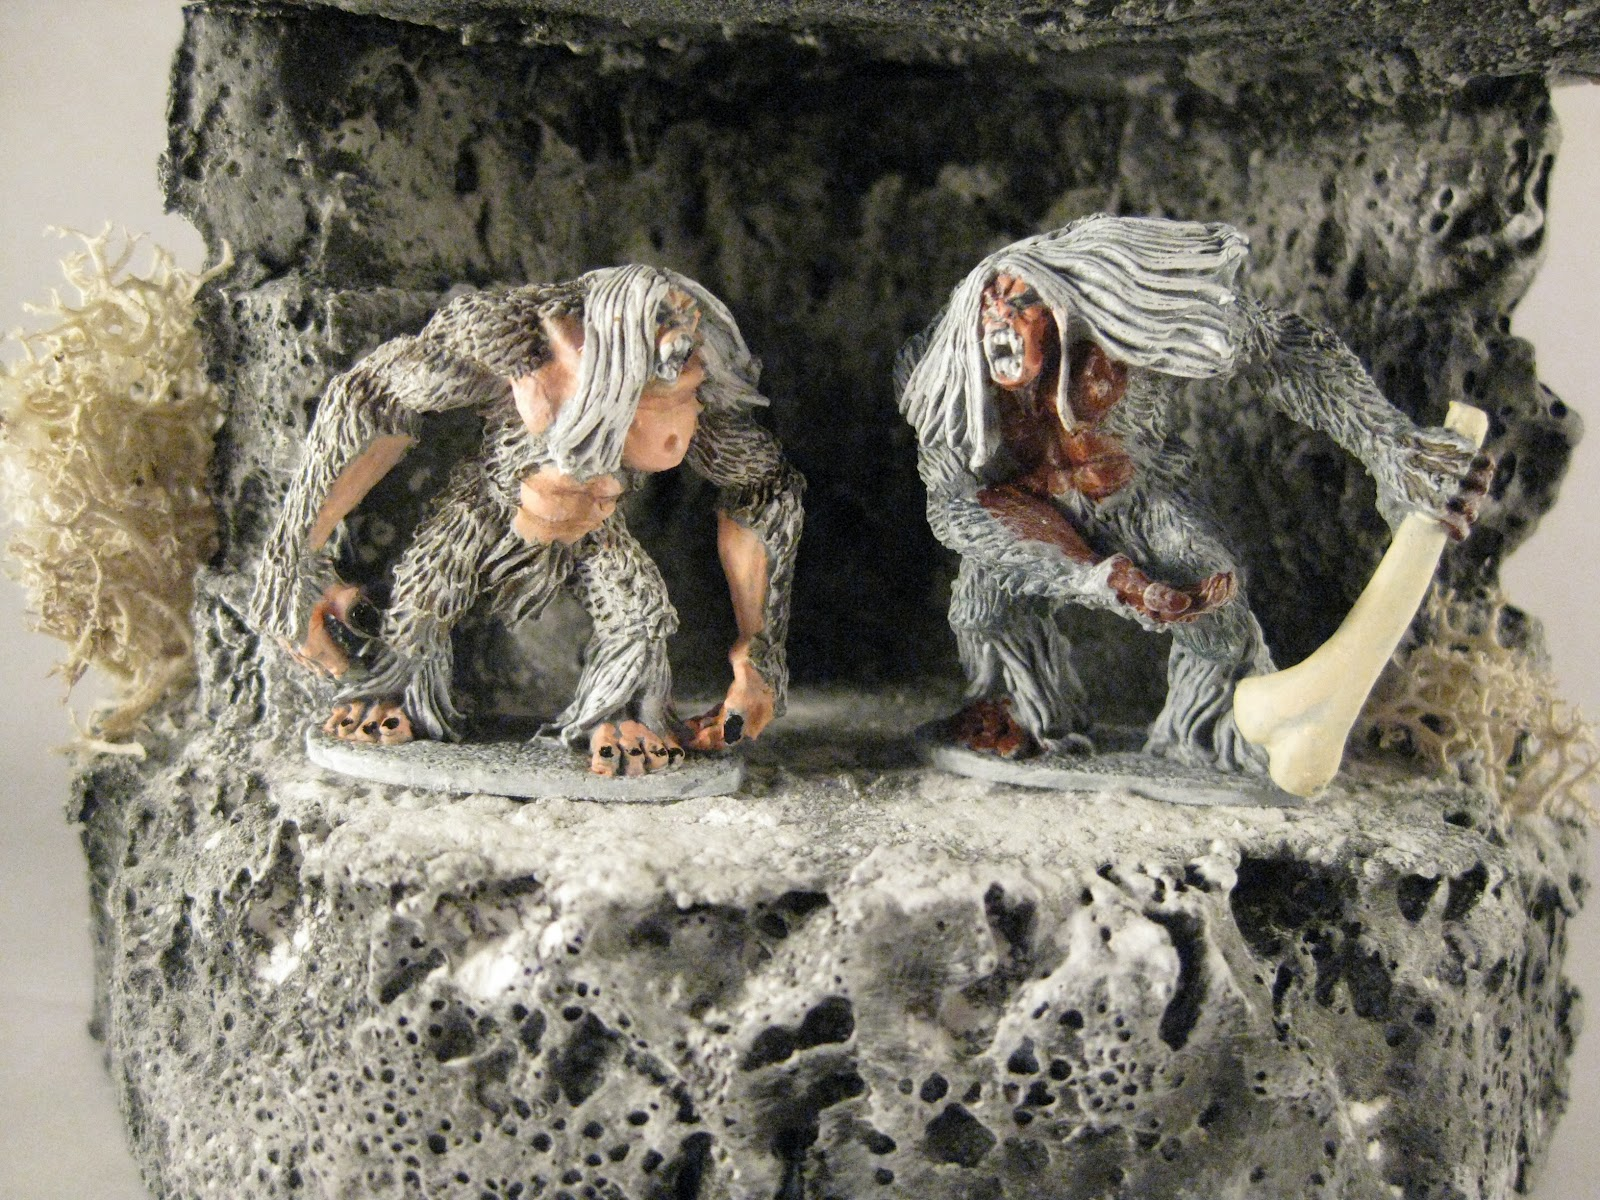 Yeti, Sasquatch, Bigfoot - Man-Apes of the Wild ...